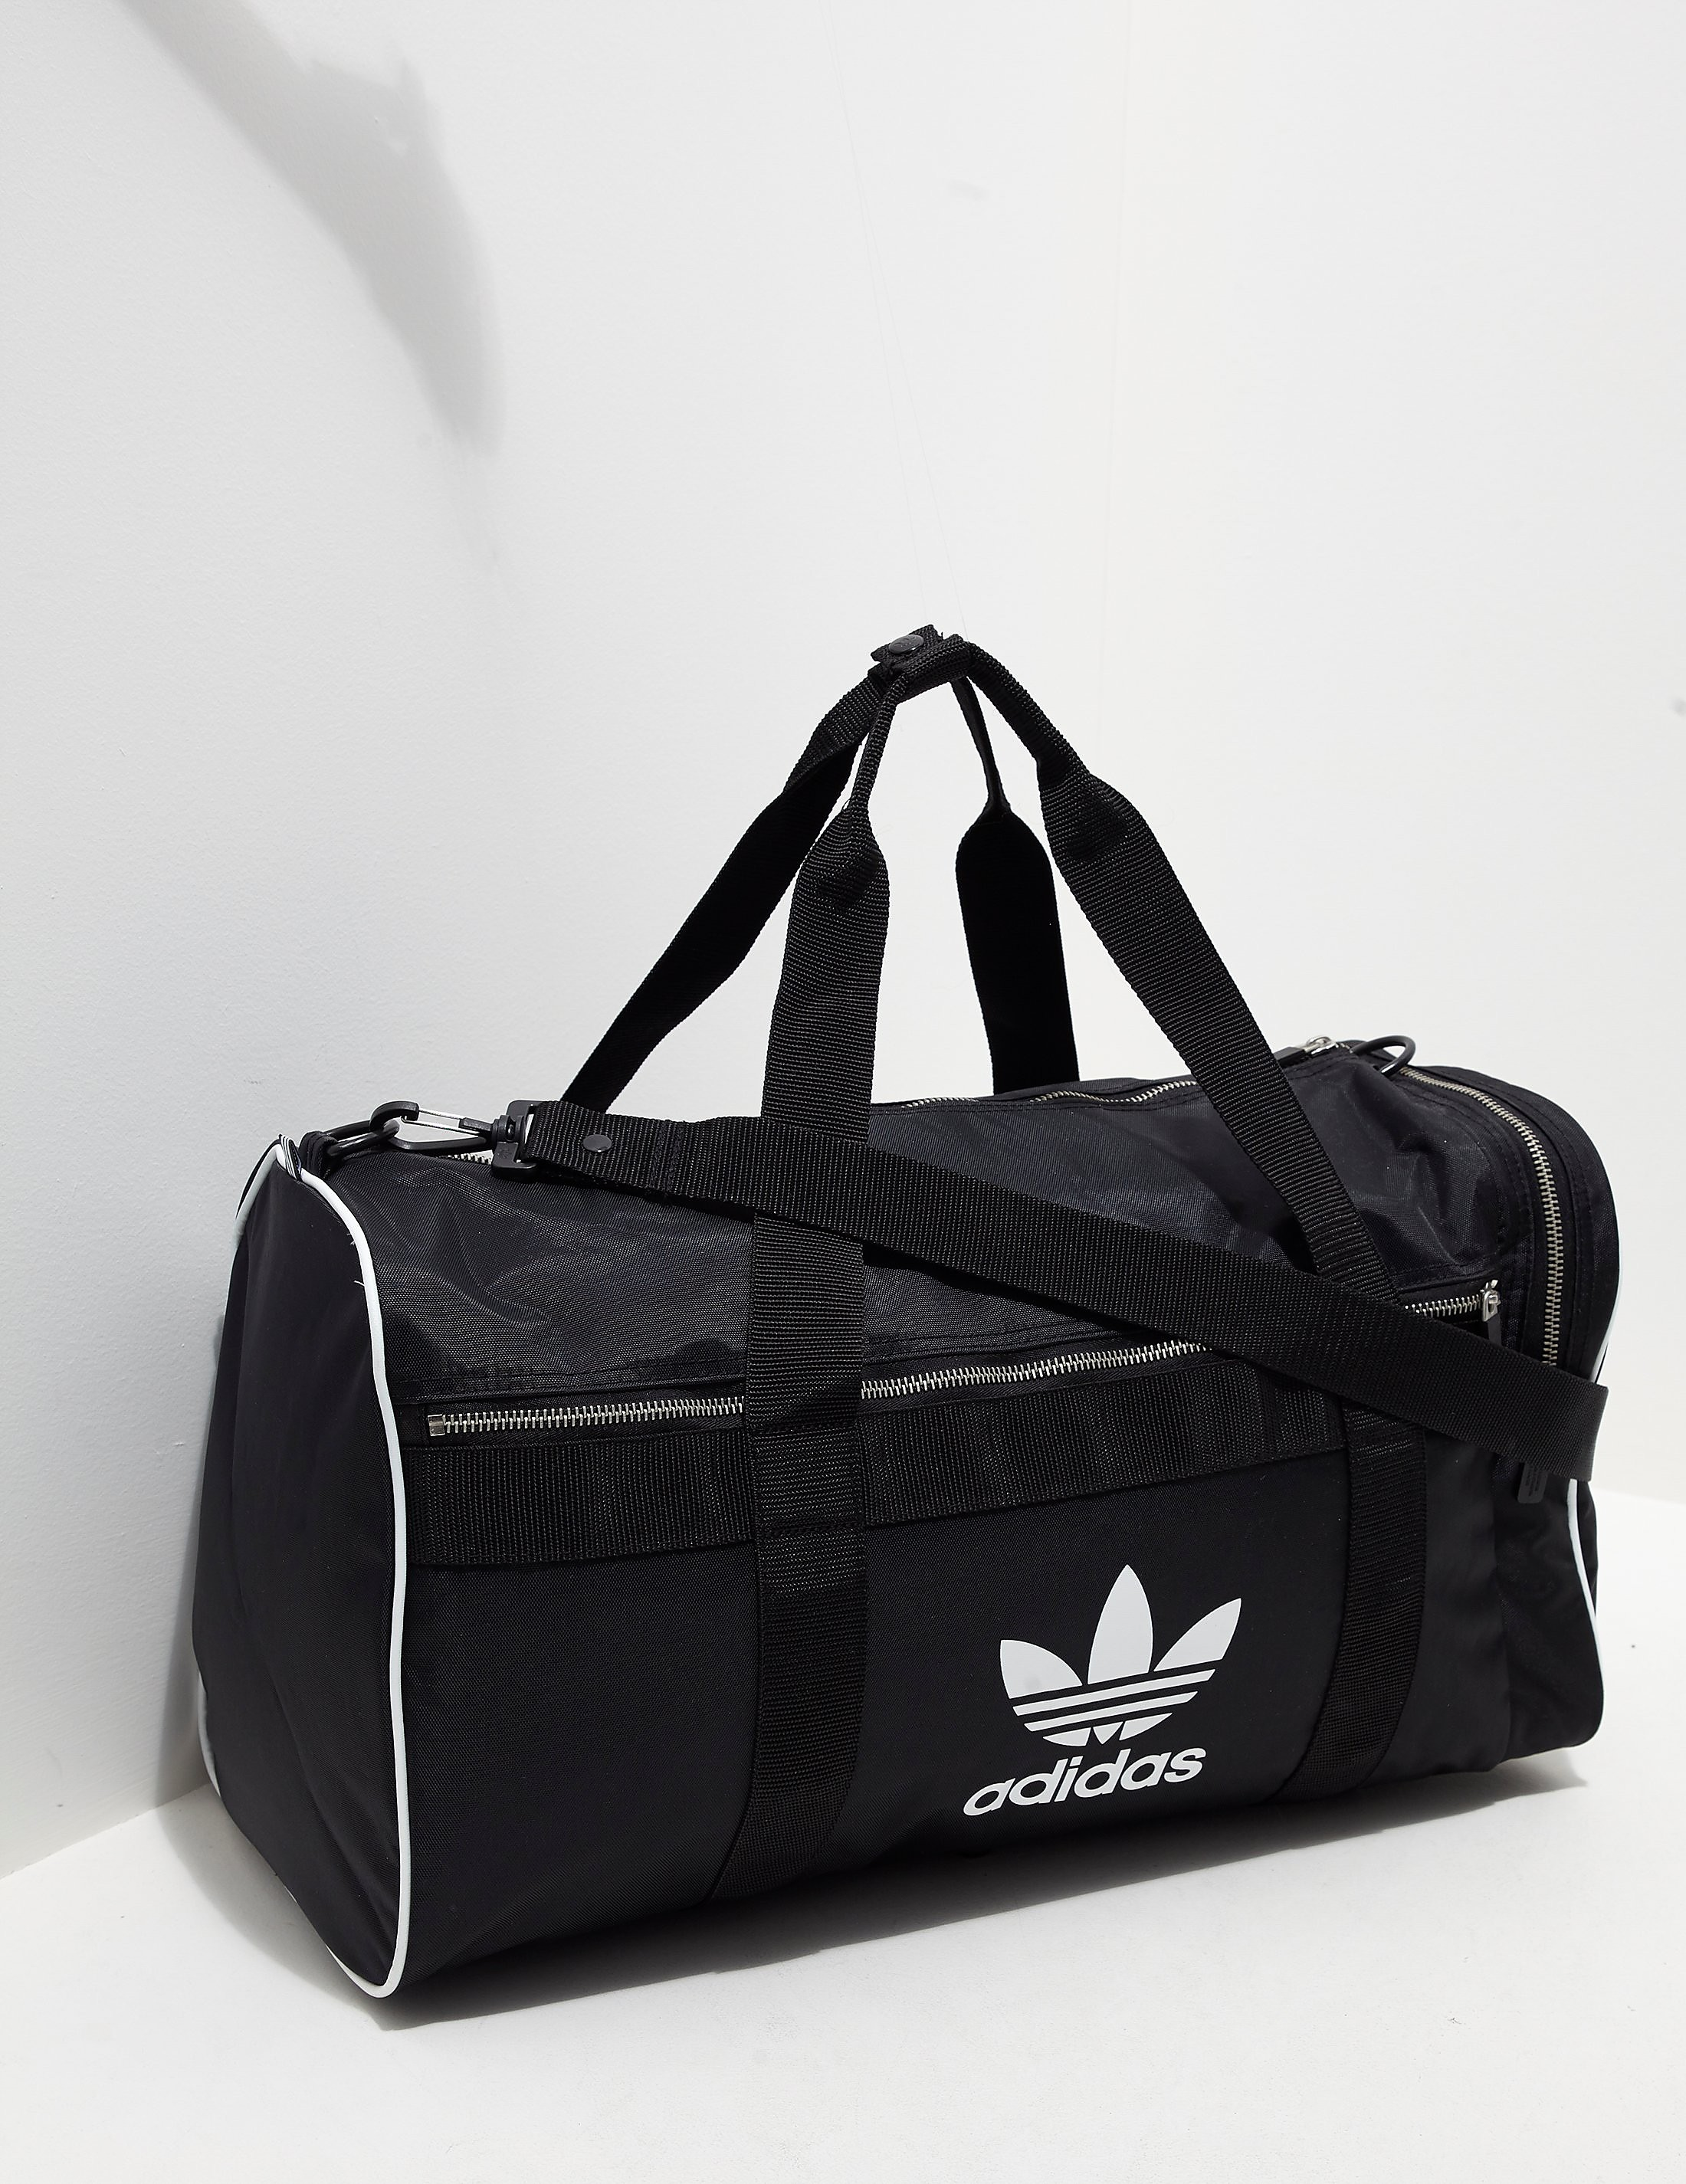 adidas Originals Trefoil Duffel Bag